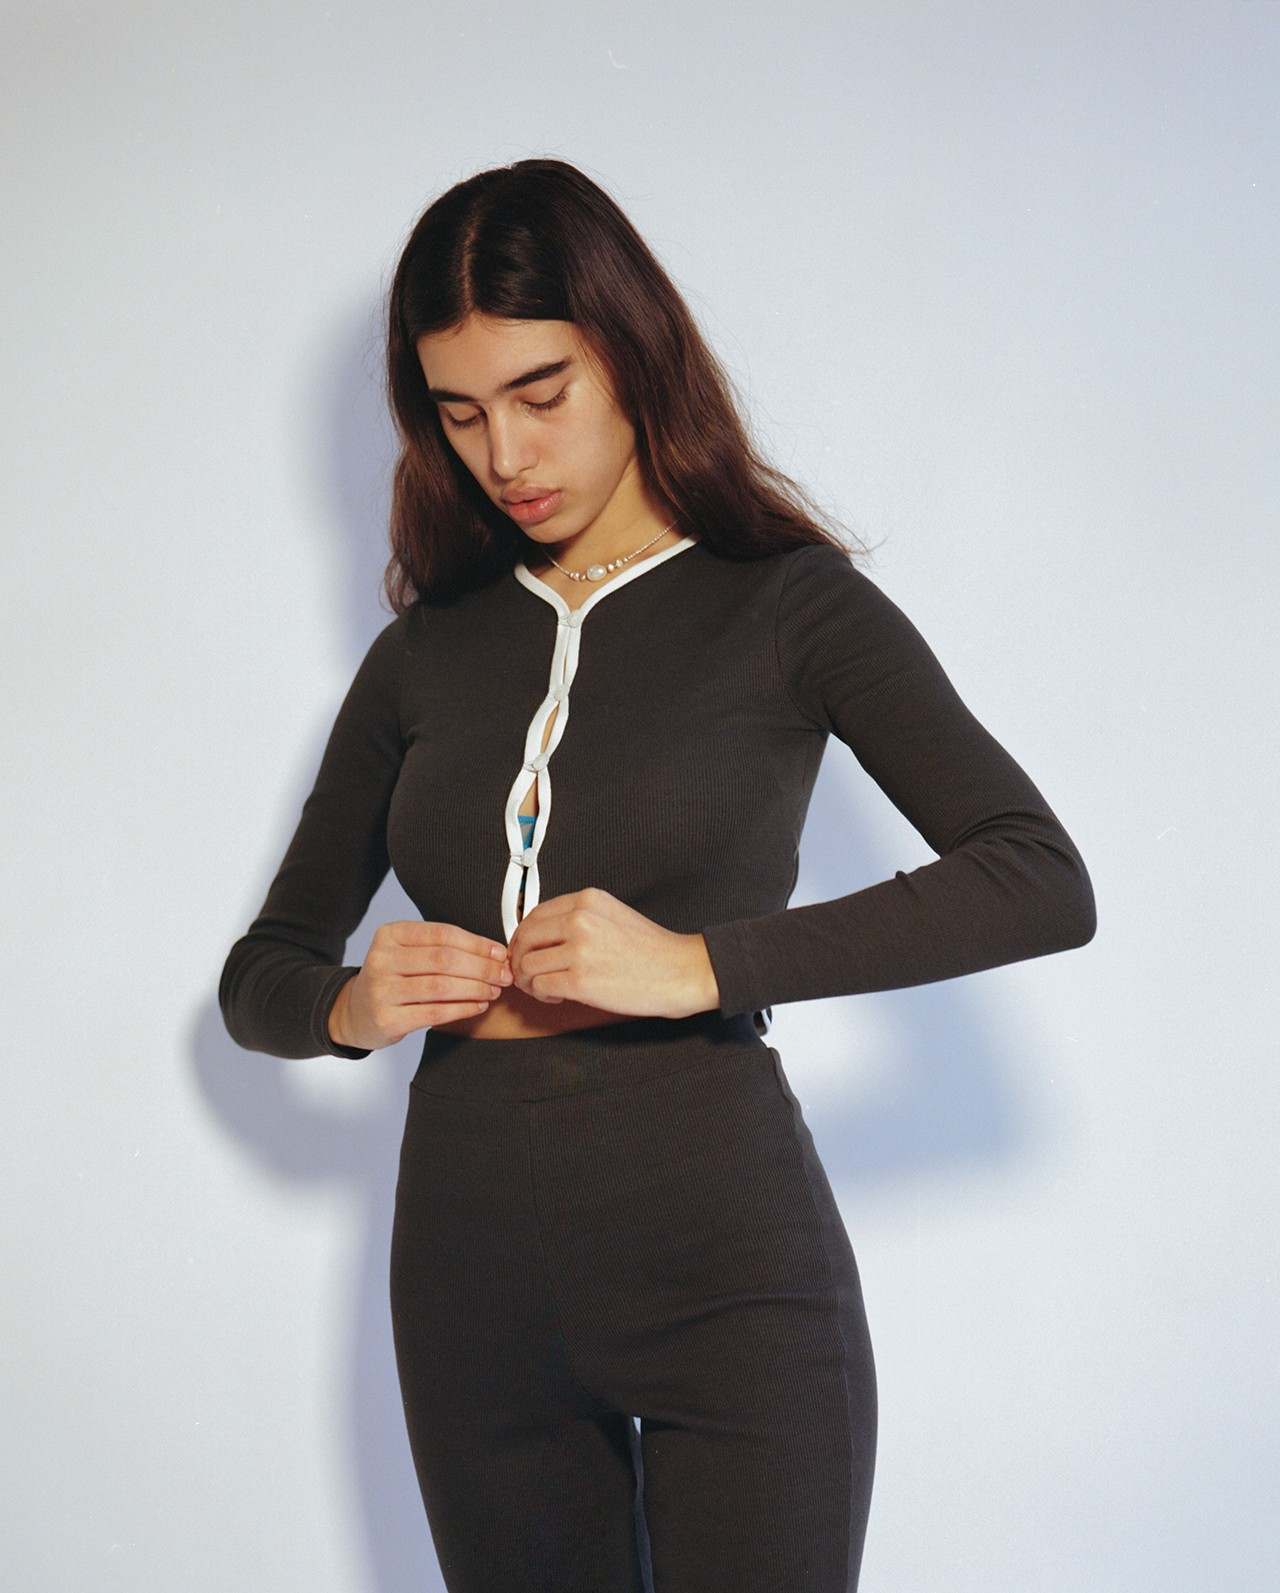 Peachy Den Loungewear London UK Indie Womenswear Fashion Brand Lilliana set Cardigan Top Bottoms Trousers Pants '70s Model